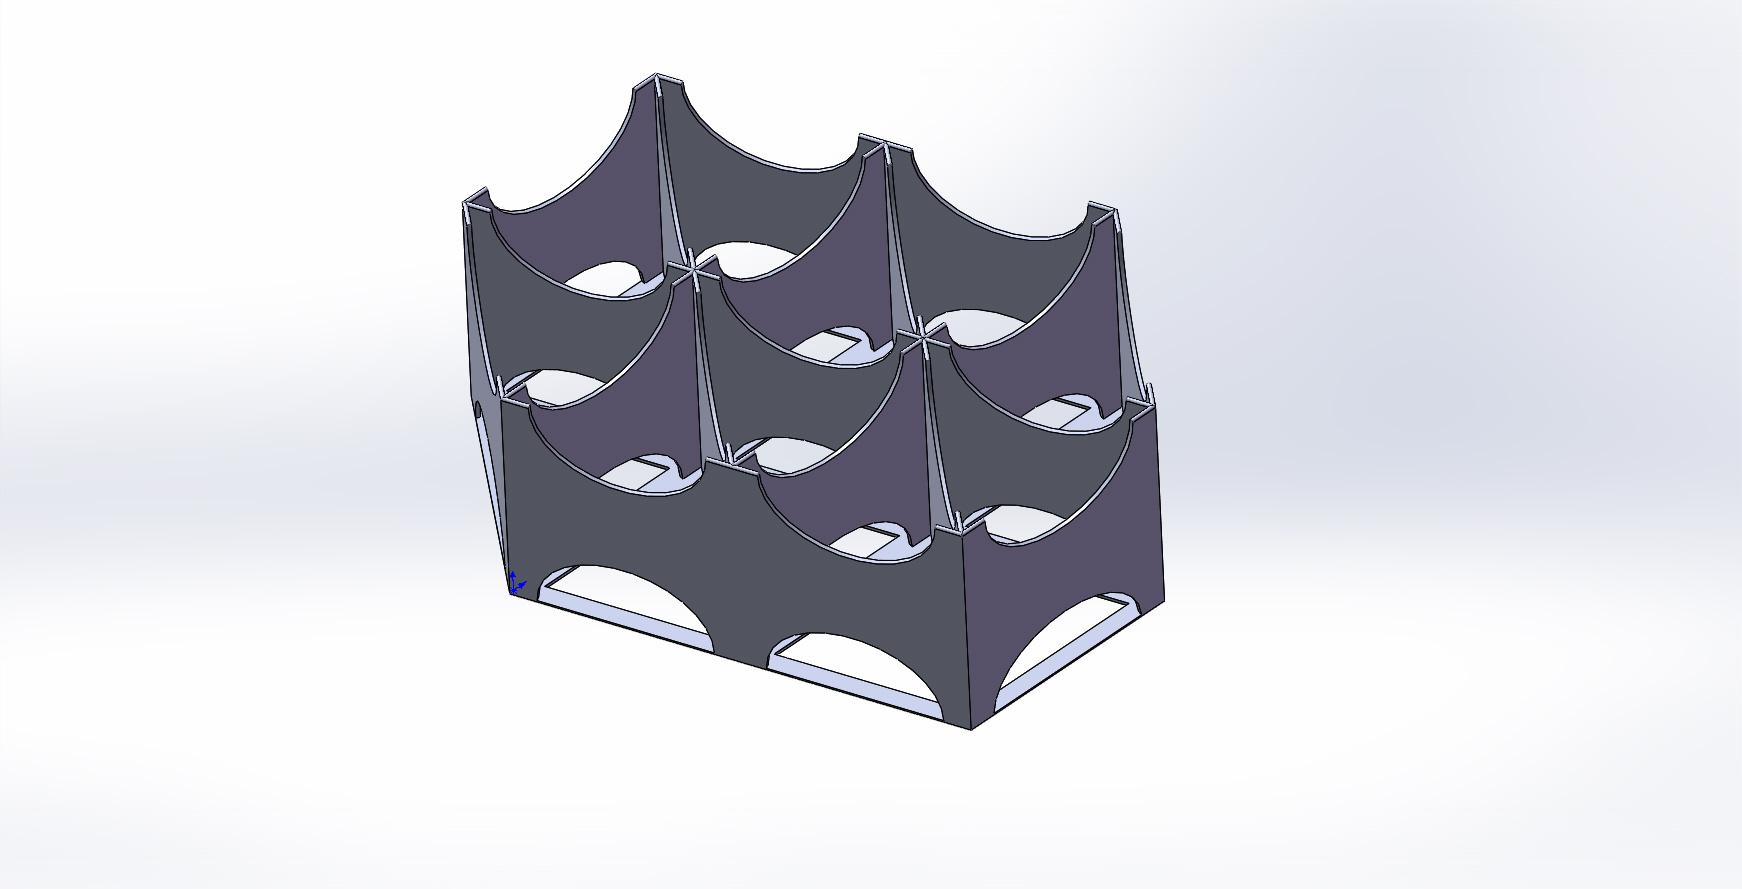 Моделирование футляра по эскизам заказчика для 3д печати